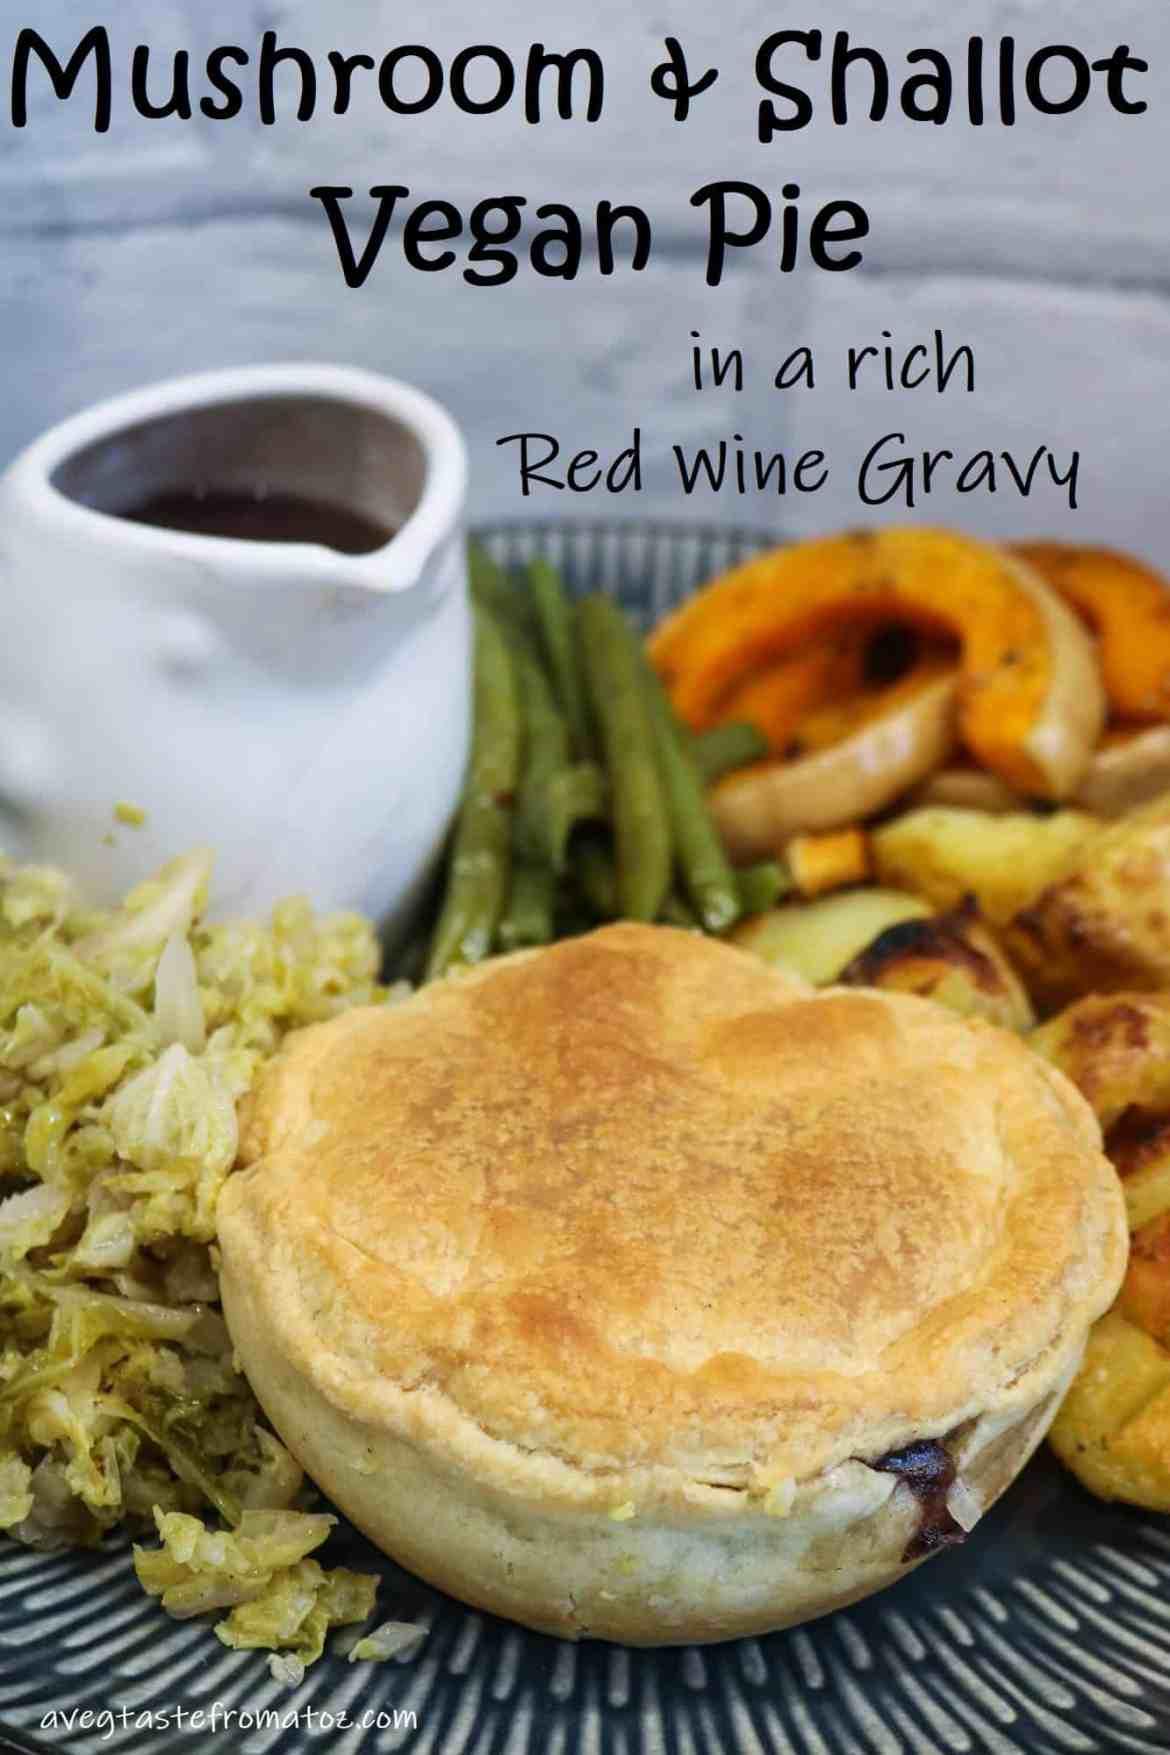 Mushrooms & Shallots Vegan Pie in a rich Red Wine Gravy #cosy #vegan #plantbased #festive #hearty #comfortfood #veganroastdinner #roastdinner #vegetarian #gravy #british #food #pie #mushroompie #redwinesauce #jus #homemade #holidays